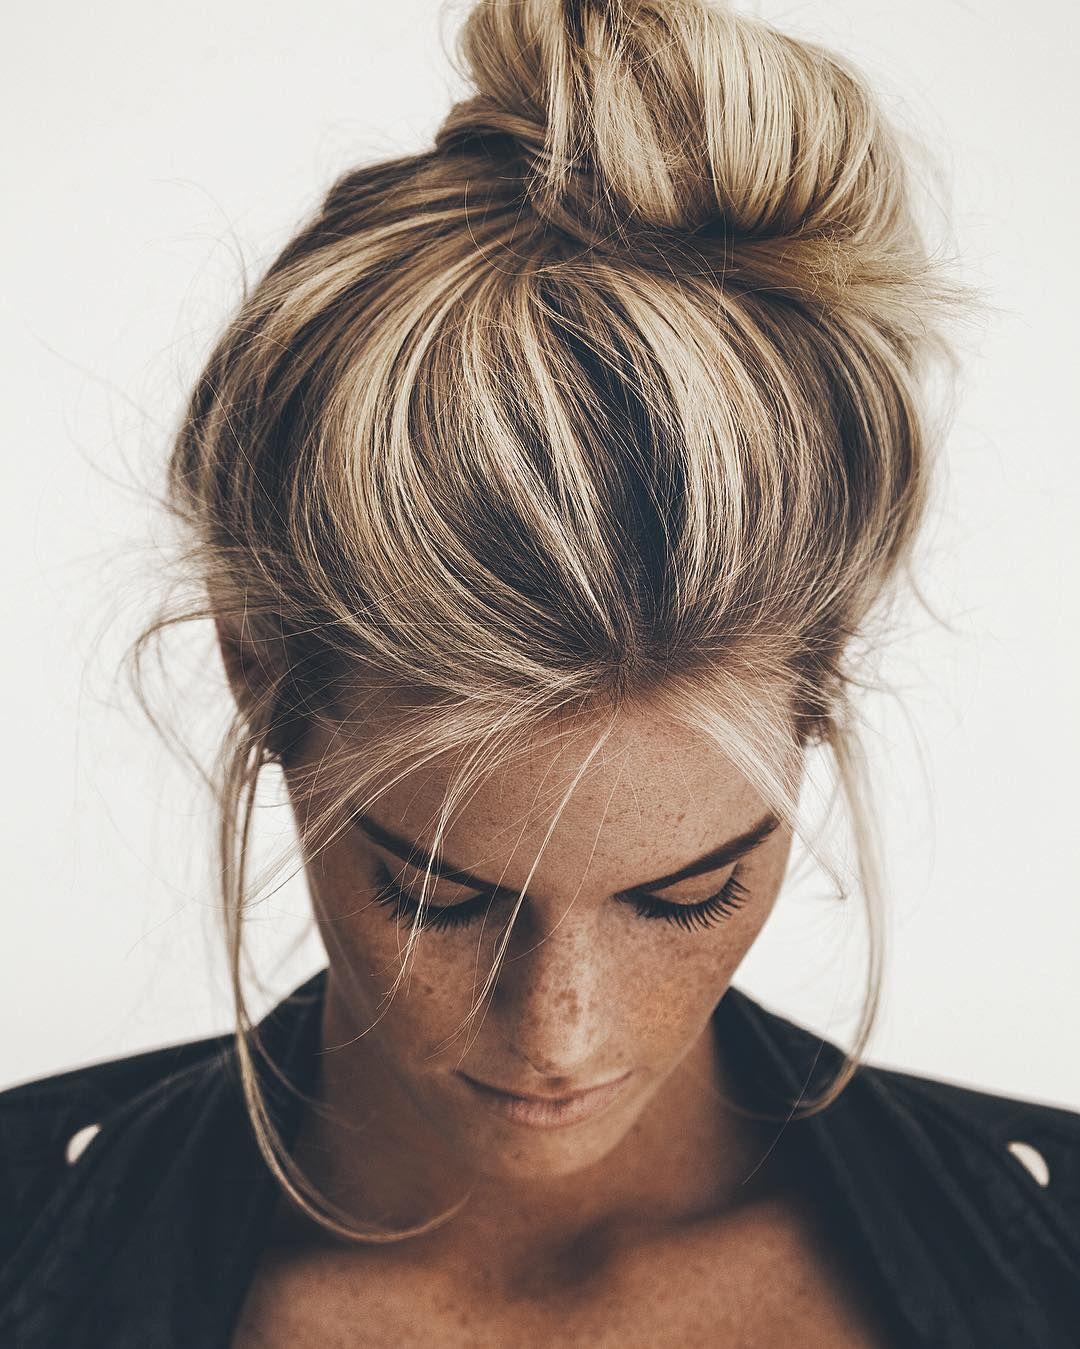 Pin by fernanda konzen on blonde love pinterest hair goals goal